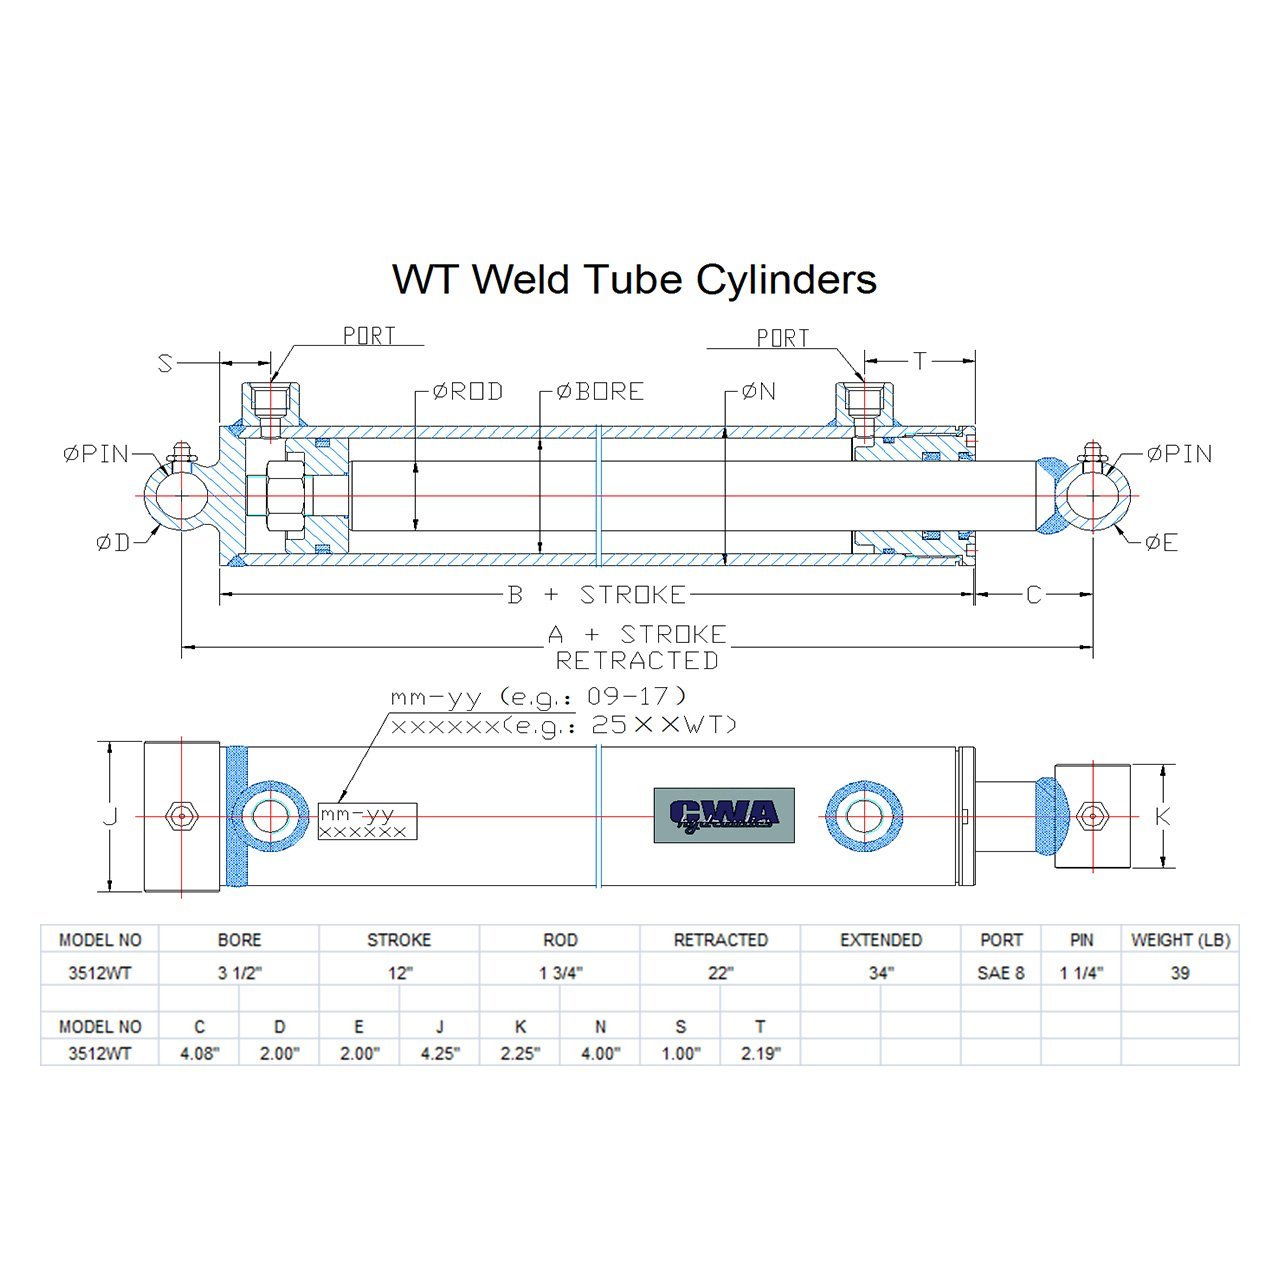 CWA Hydraulics WT Weld Cross Tube Hydraulic Cylinder 3 1//2 Bore x 12 Stroke x 1 3//4 Rod x SAE 8 Port x 3000 PSI 3512WT